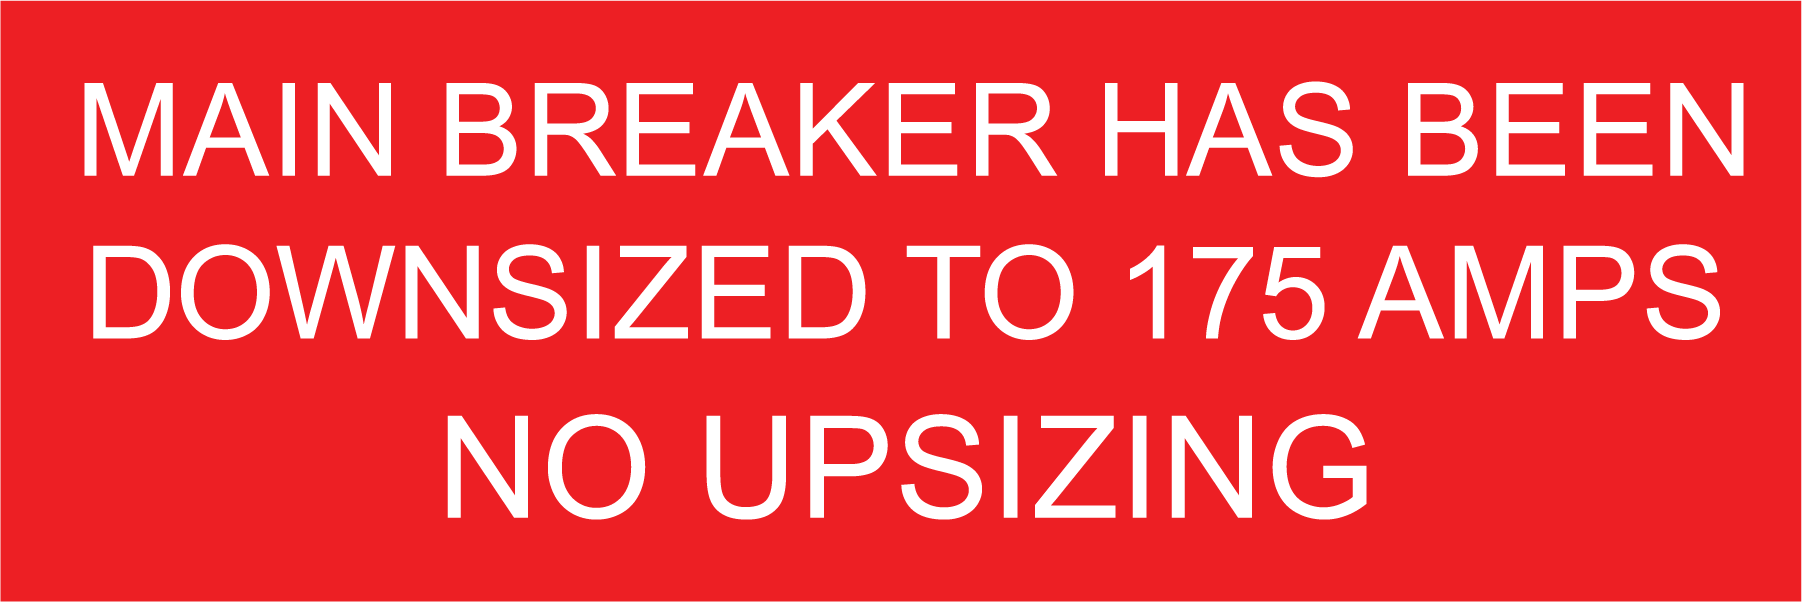 Main Breaker has been downsized.png